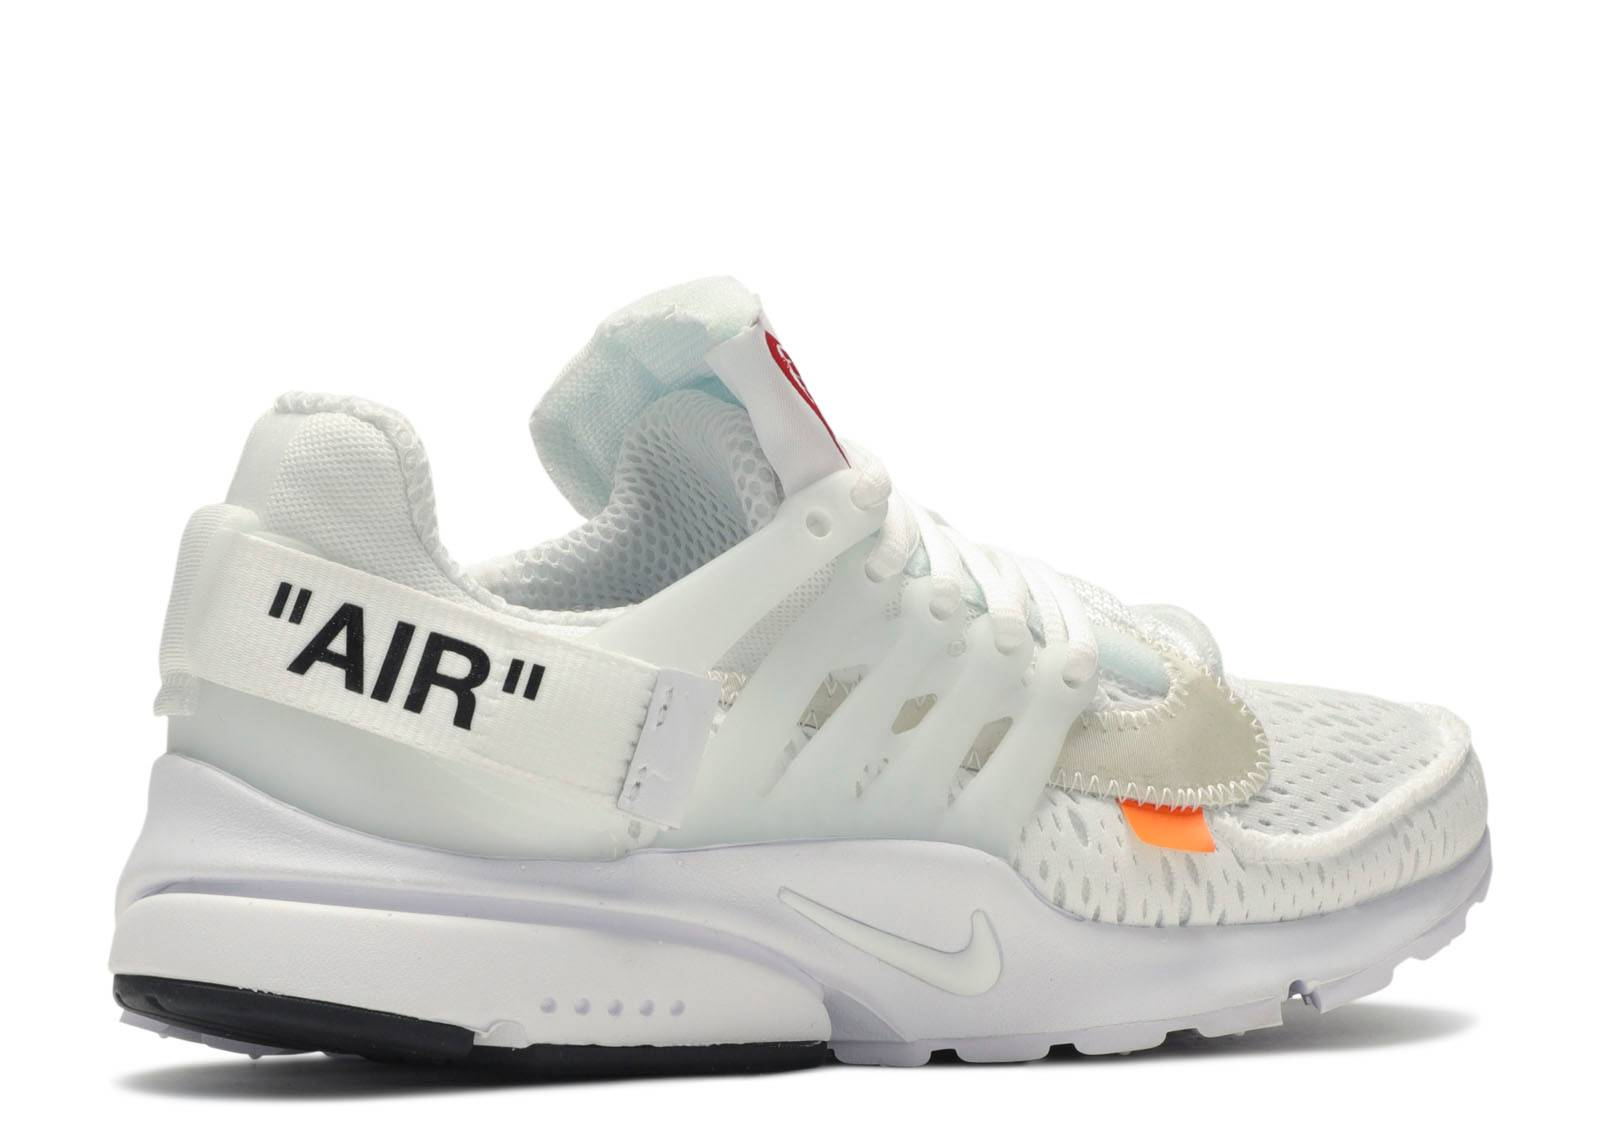 Resignación Azul levantar  Off White X Air Presto 'White' - Nike - AA3830 100 - white/black/cone |  Flight Club